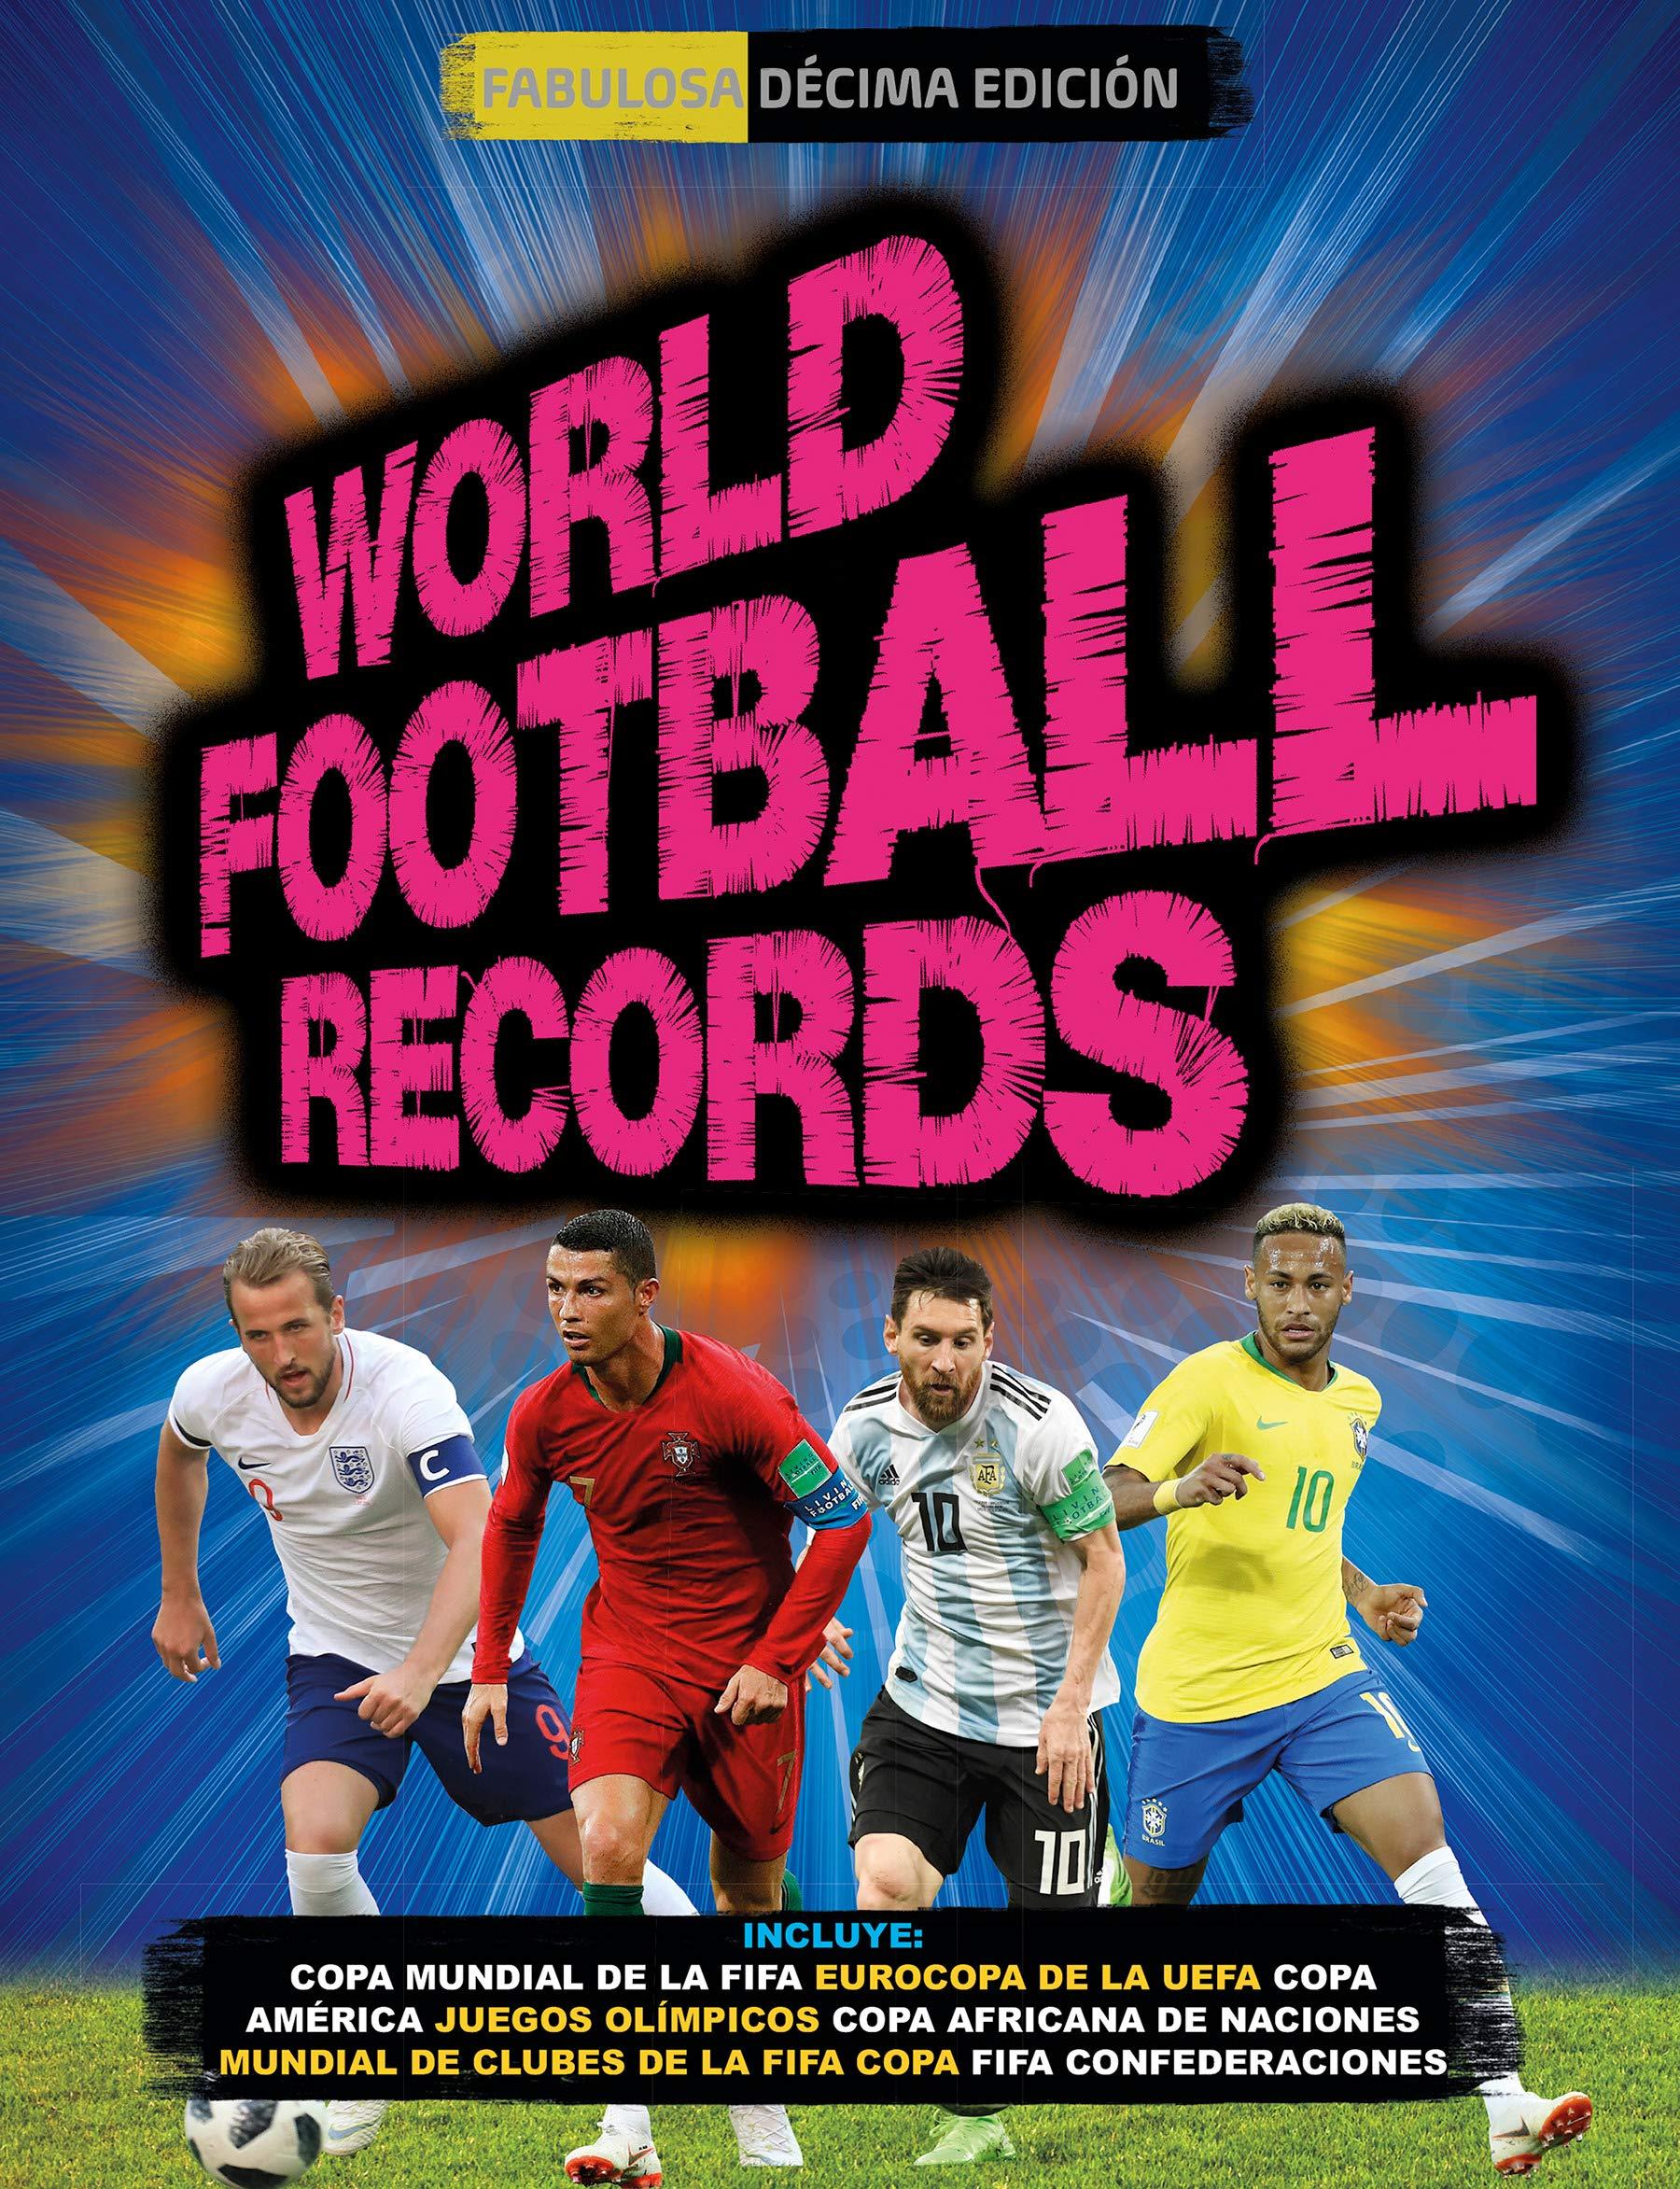 World Football Records 2018 (Libros ilustrados): Amazon.es: Varios ...